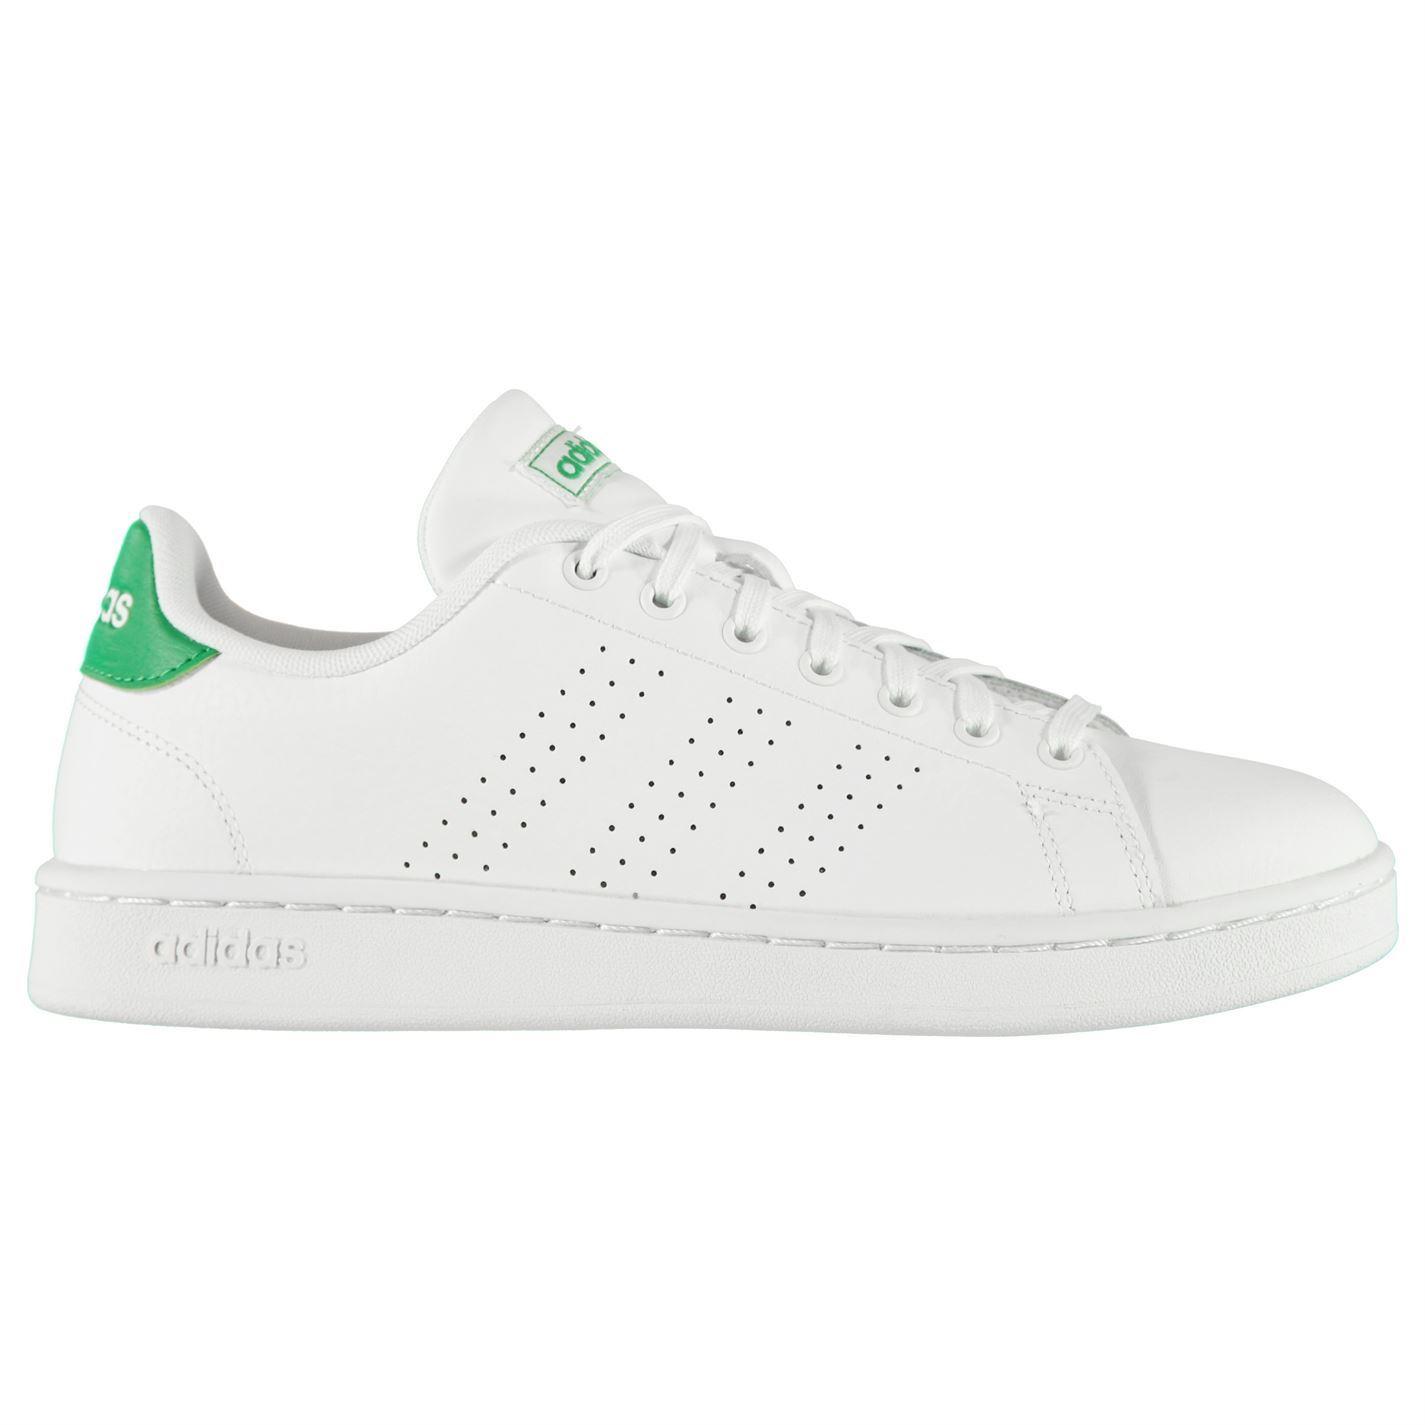 Adidas-Advantage-Baskets-Homme-Chaussures-De-Loisirs-Chaussures-Baskets miniature 4